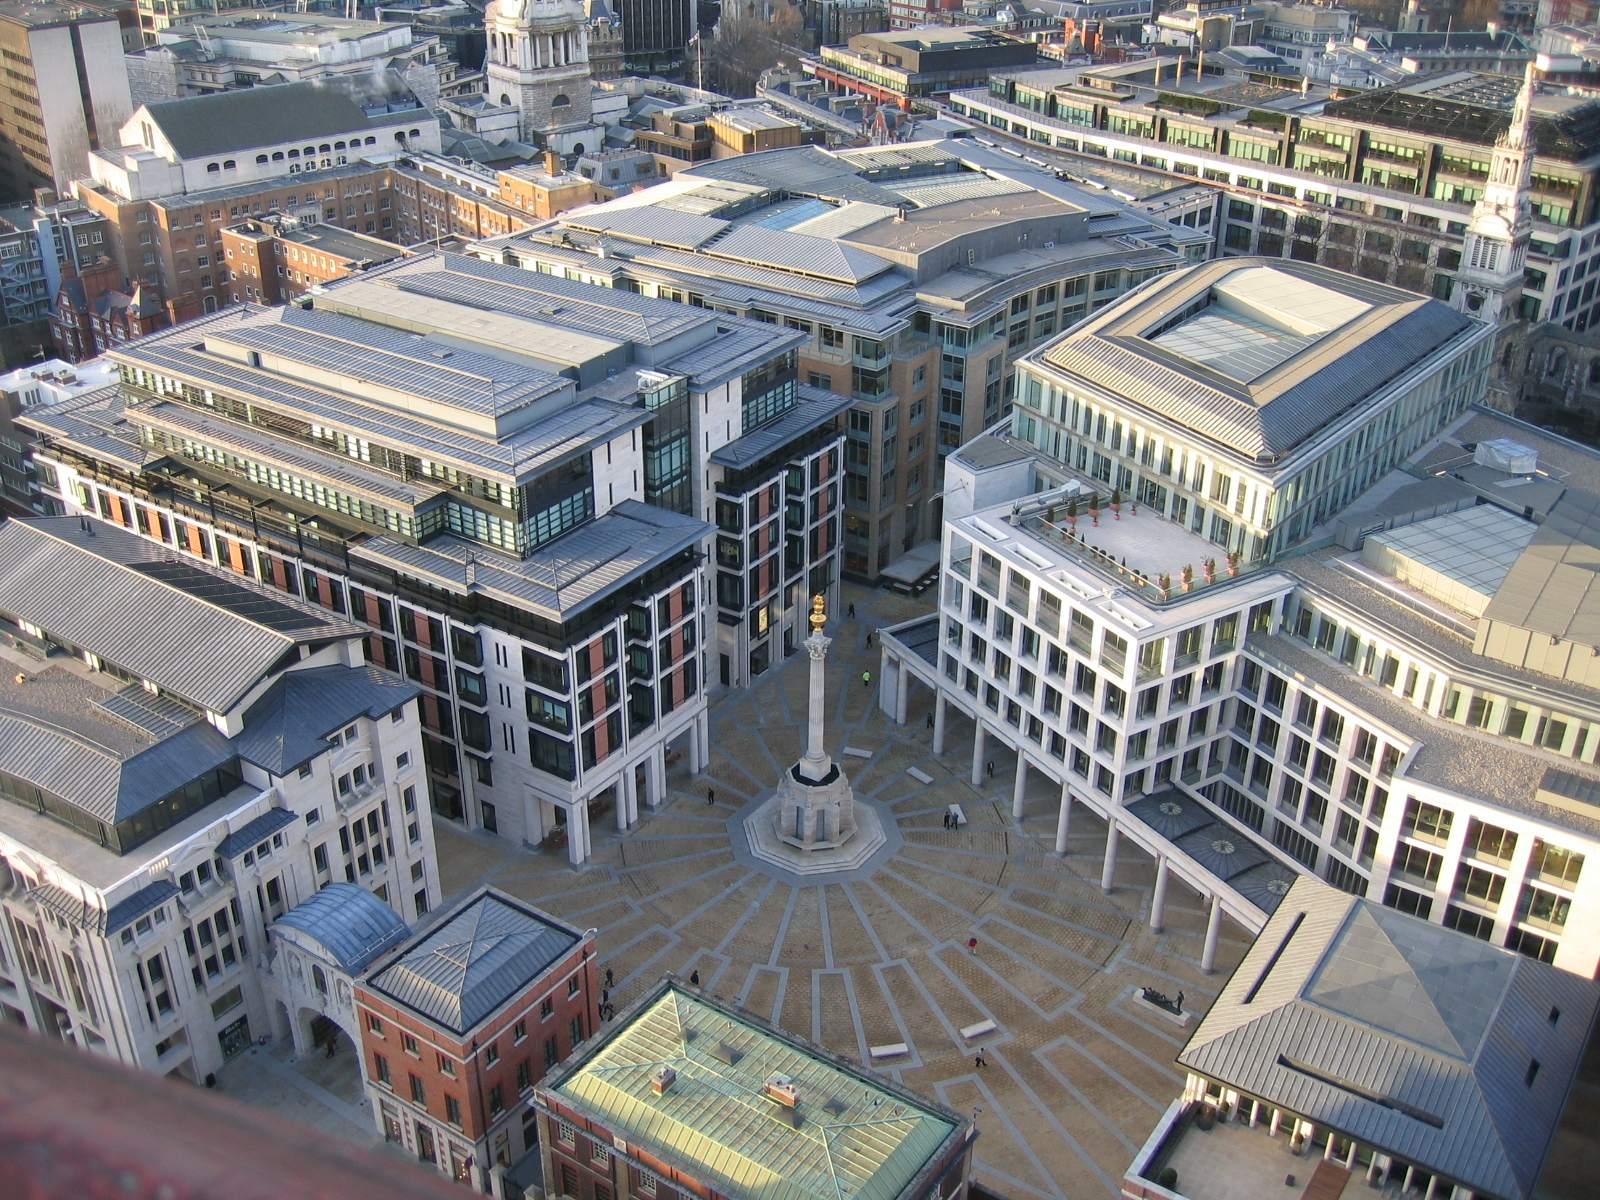 London Stock Exchange Gebäude in London